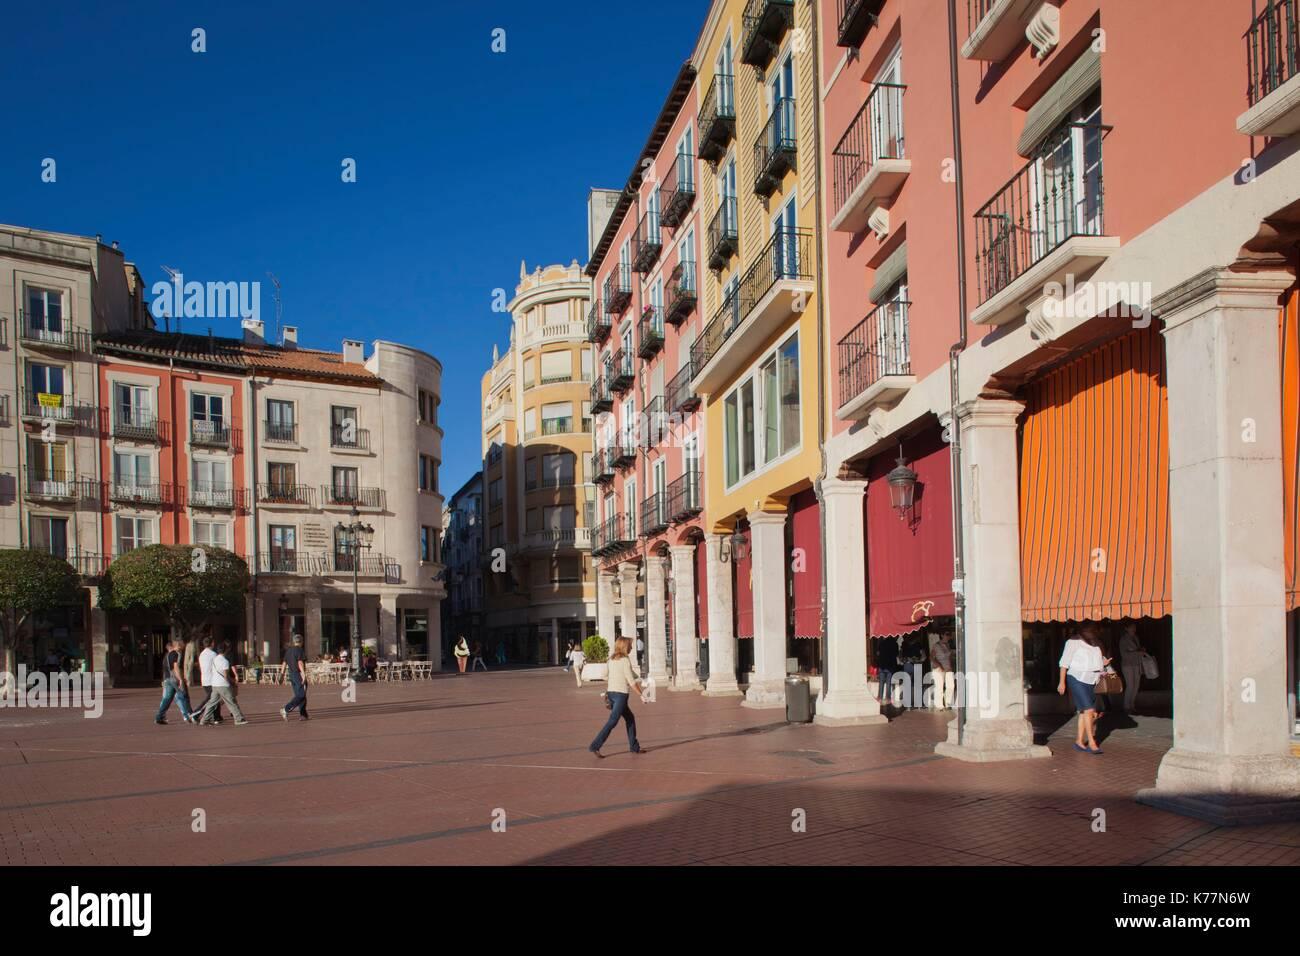 Spanien, Region Castilla y León, Burgos Provinz, Burgos, Plaza Mayor Stockbild